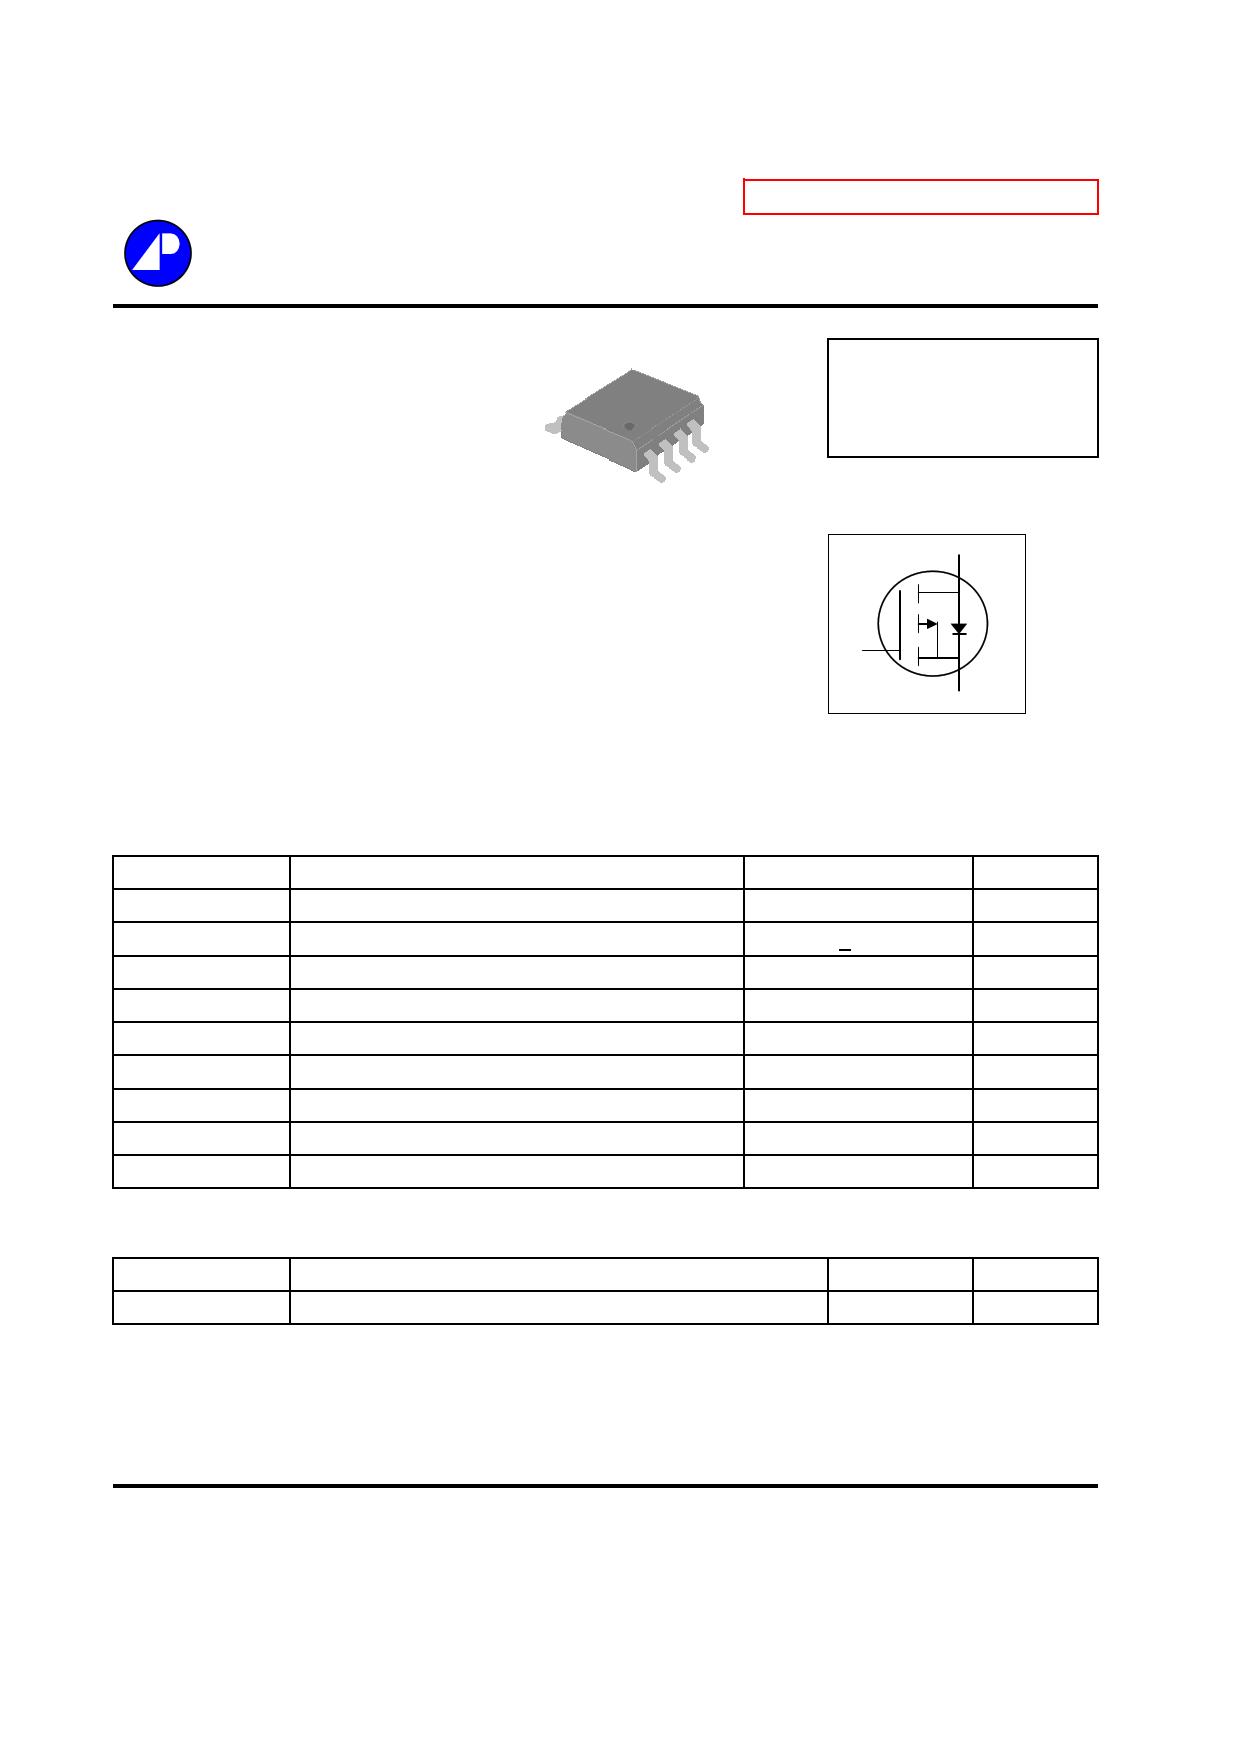 AP4435GM-HF Даташит, Описание, Даташиты